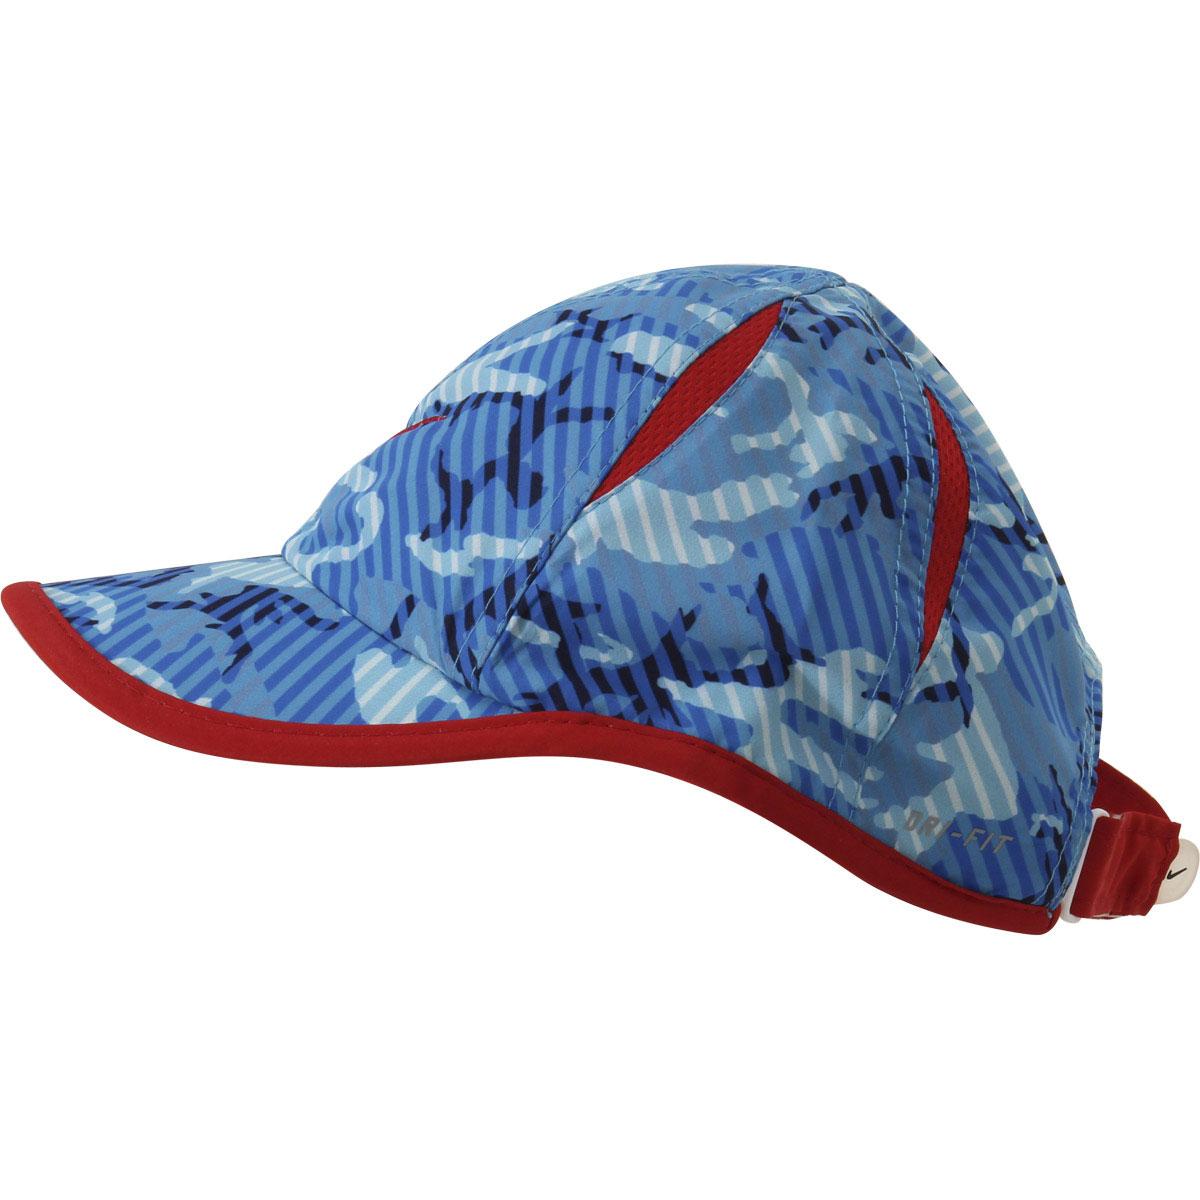 00888f71a32 Nike Boy s Dri-Fit Embroidered Logo Baseball Cap Hat